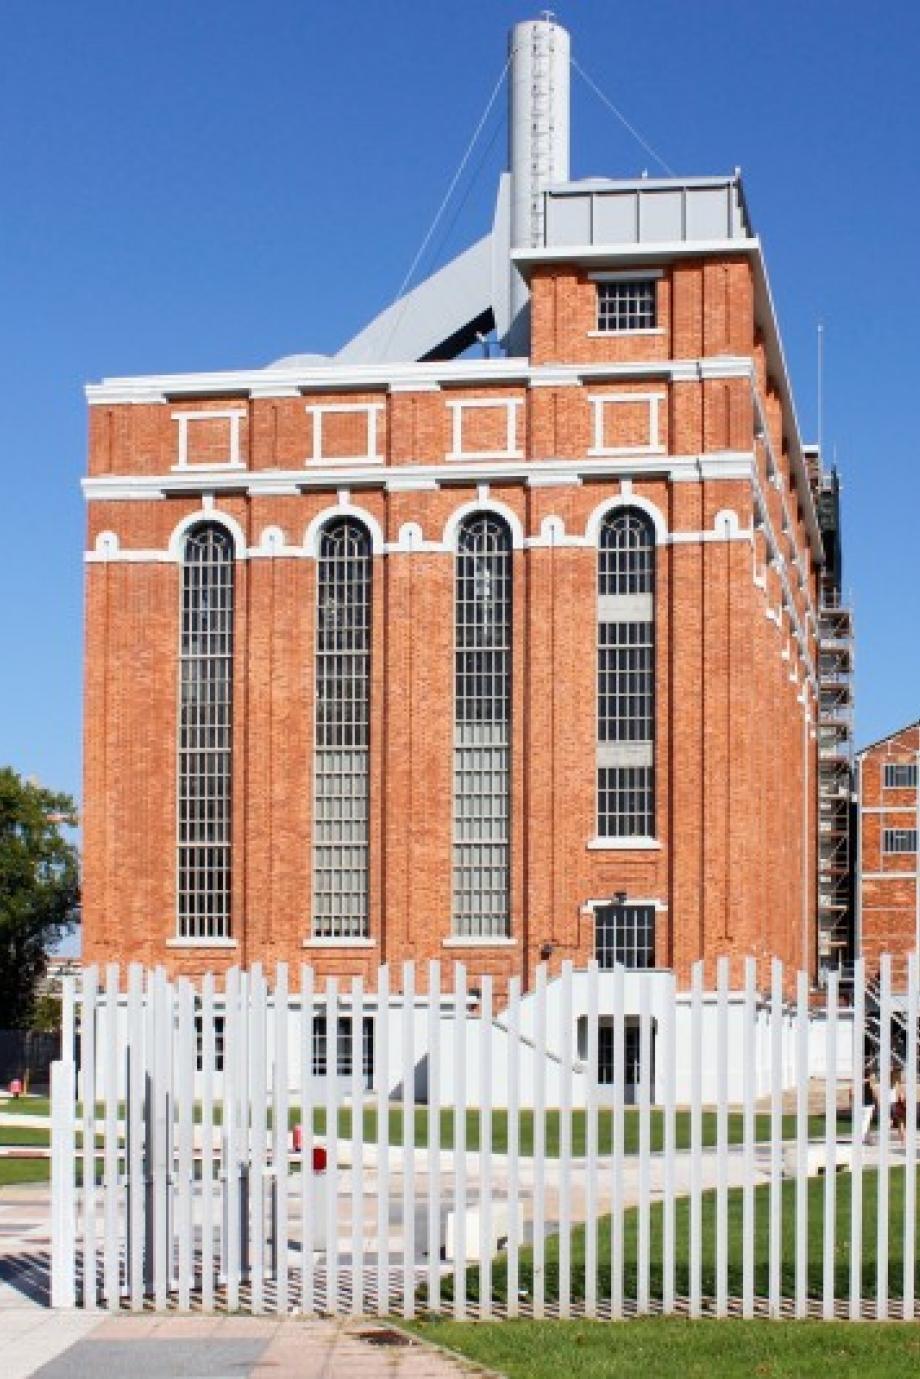 LisboaCool_Visitar_Museu_da_Eletricidade